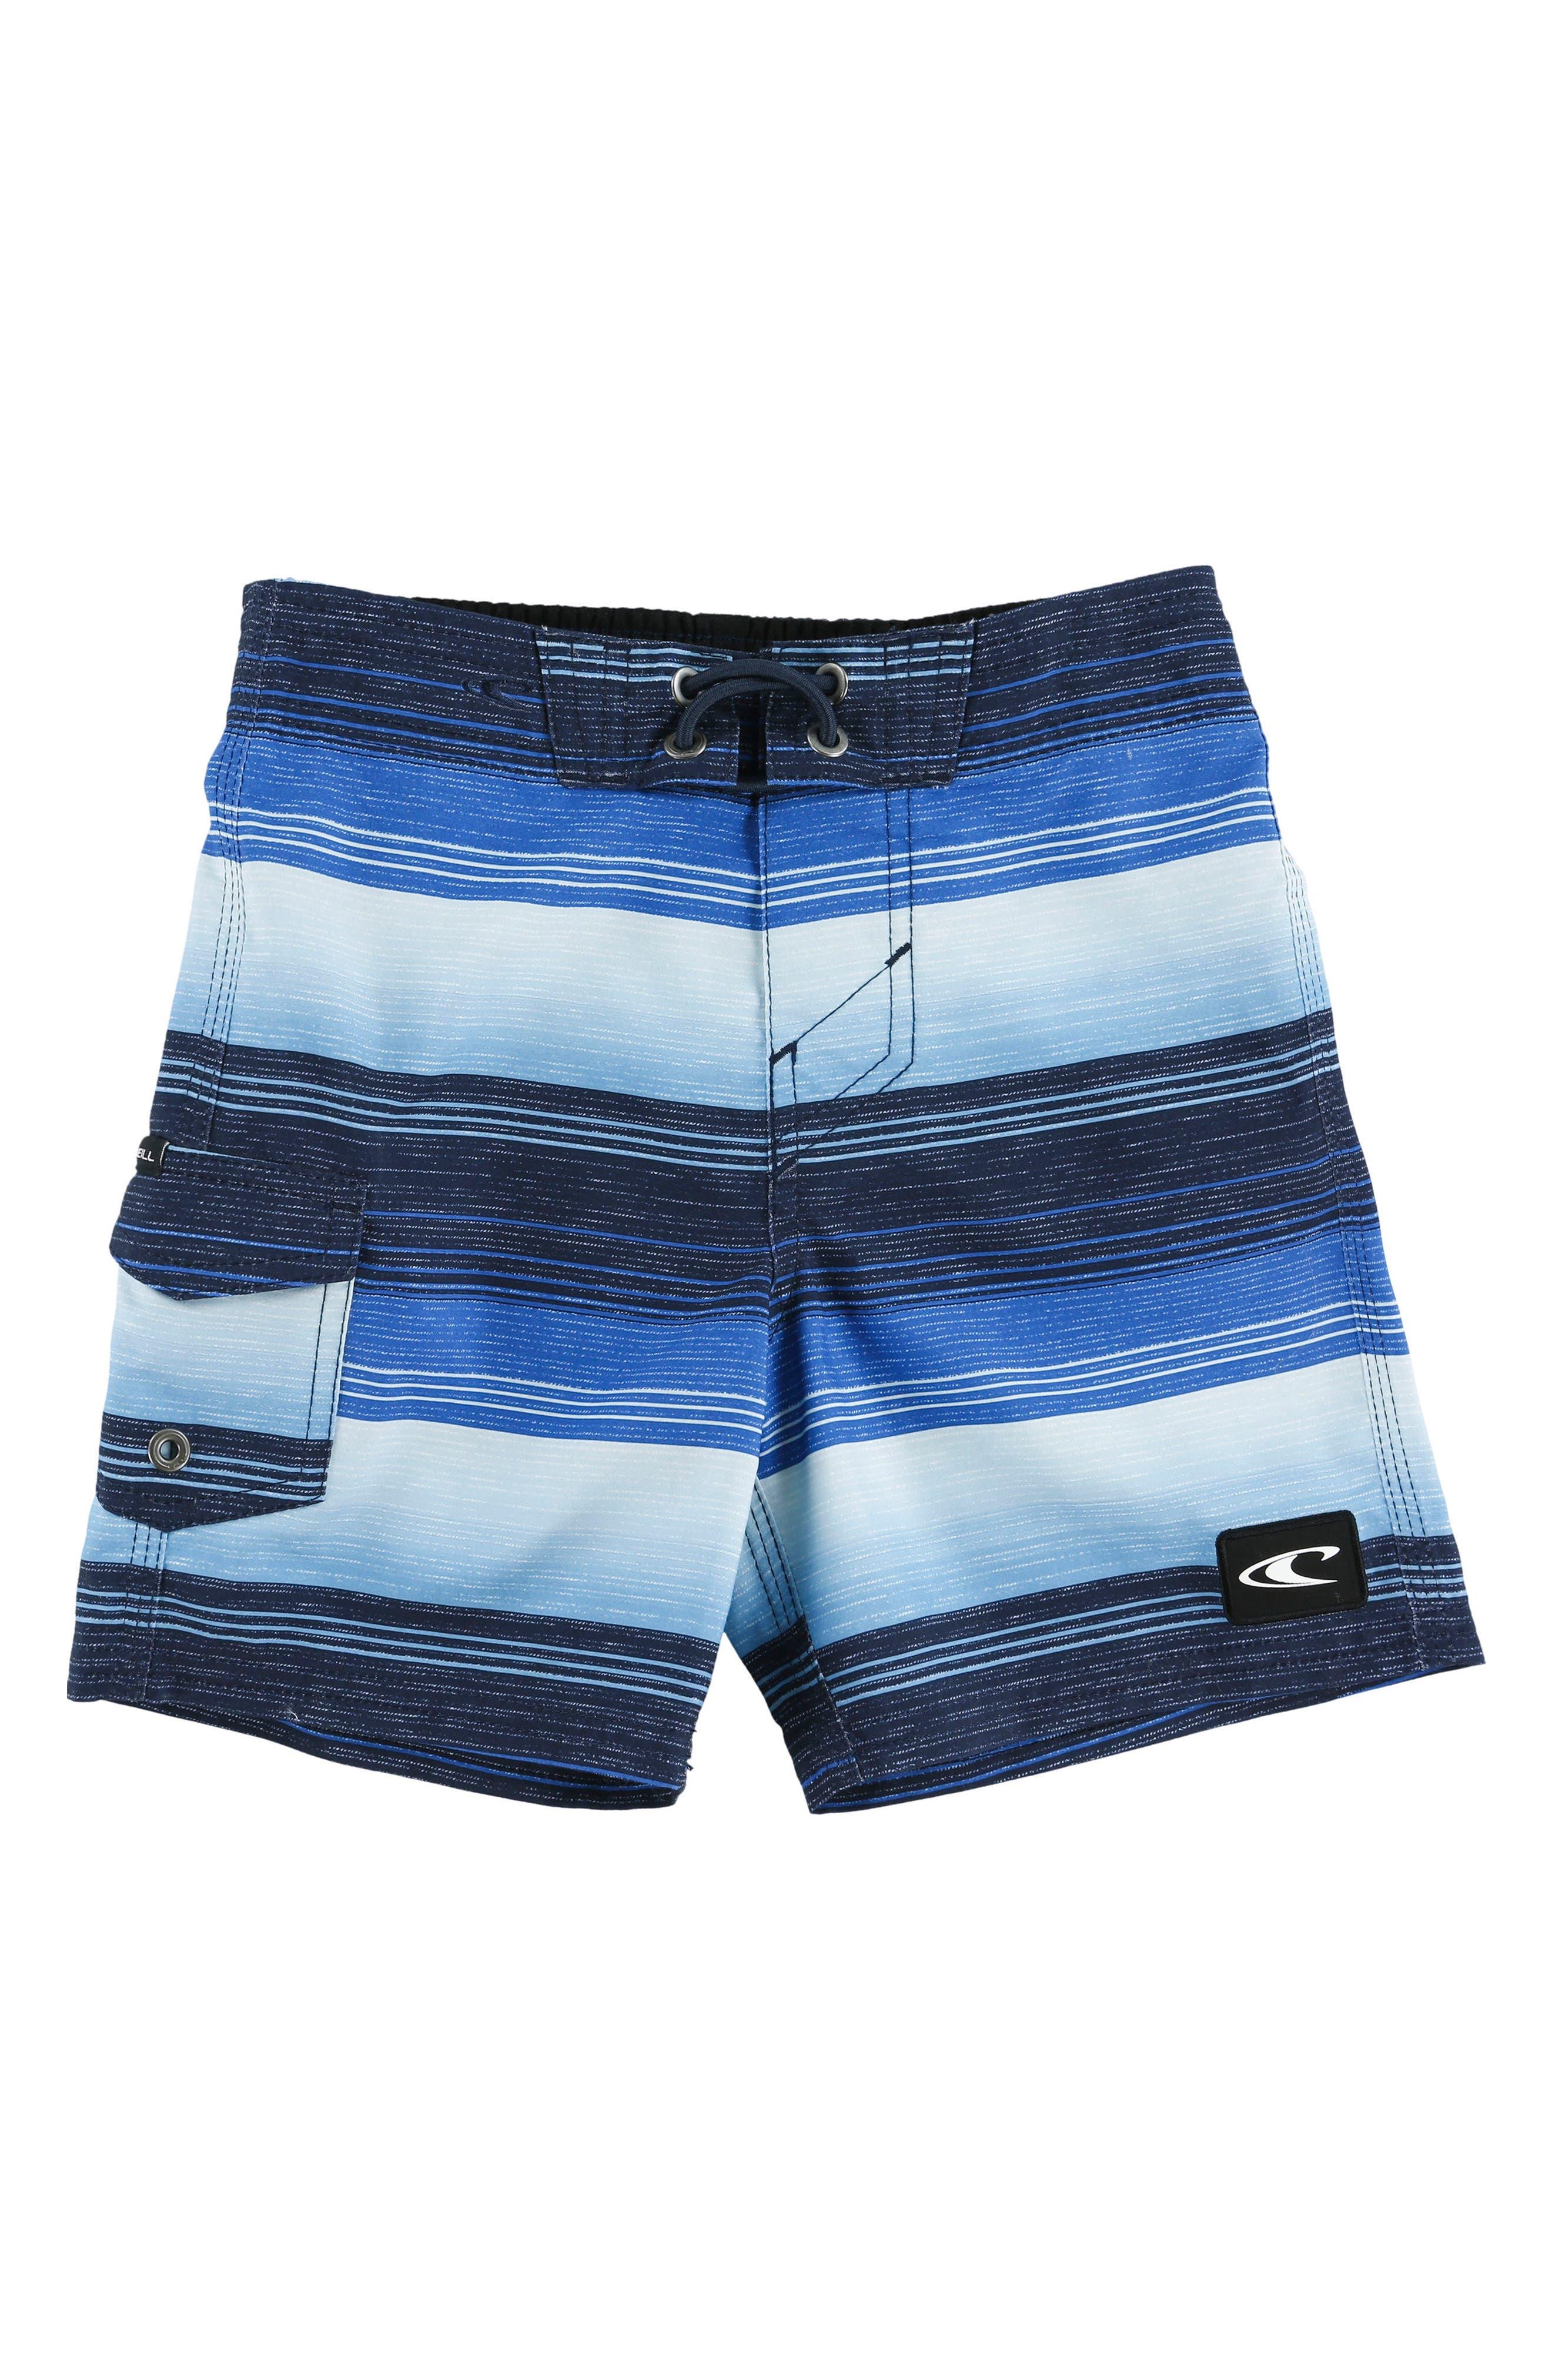 Santa Cruz Stripe Board Shorts,                             Main thumbnail 1, color,                             Blue